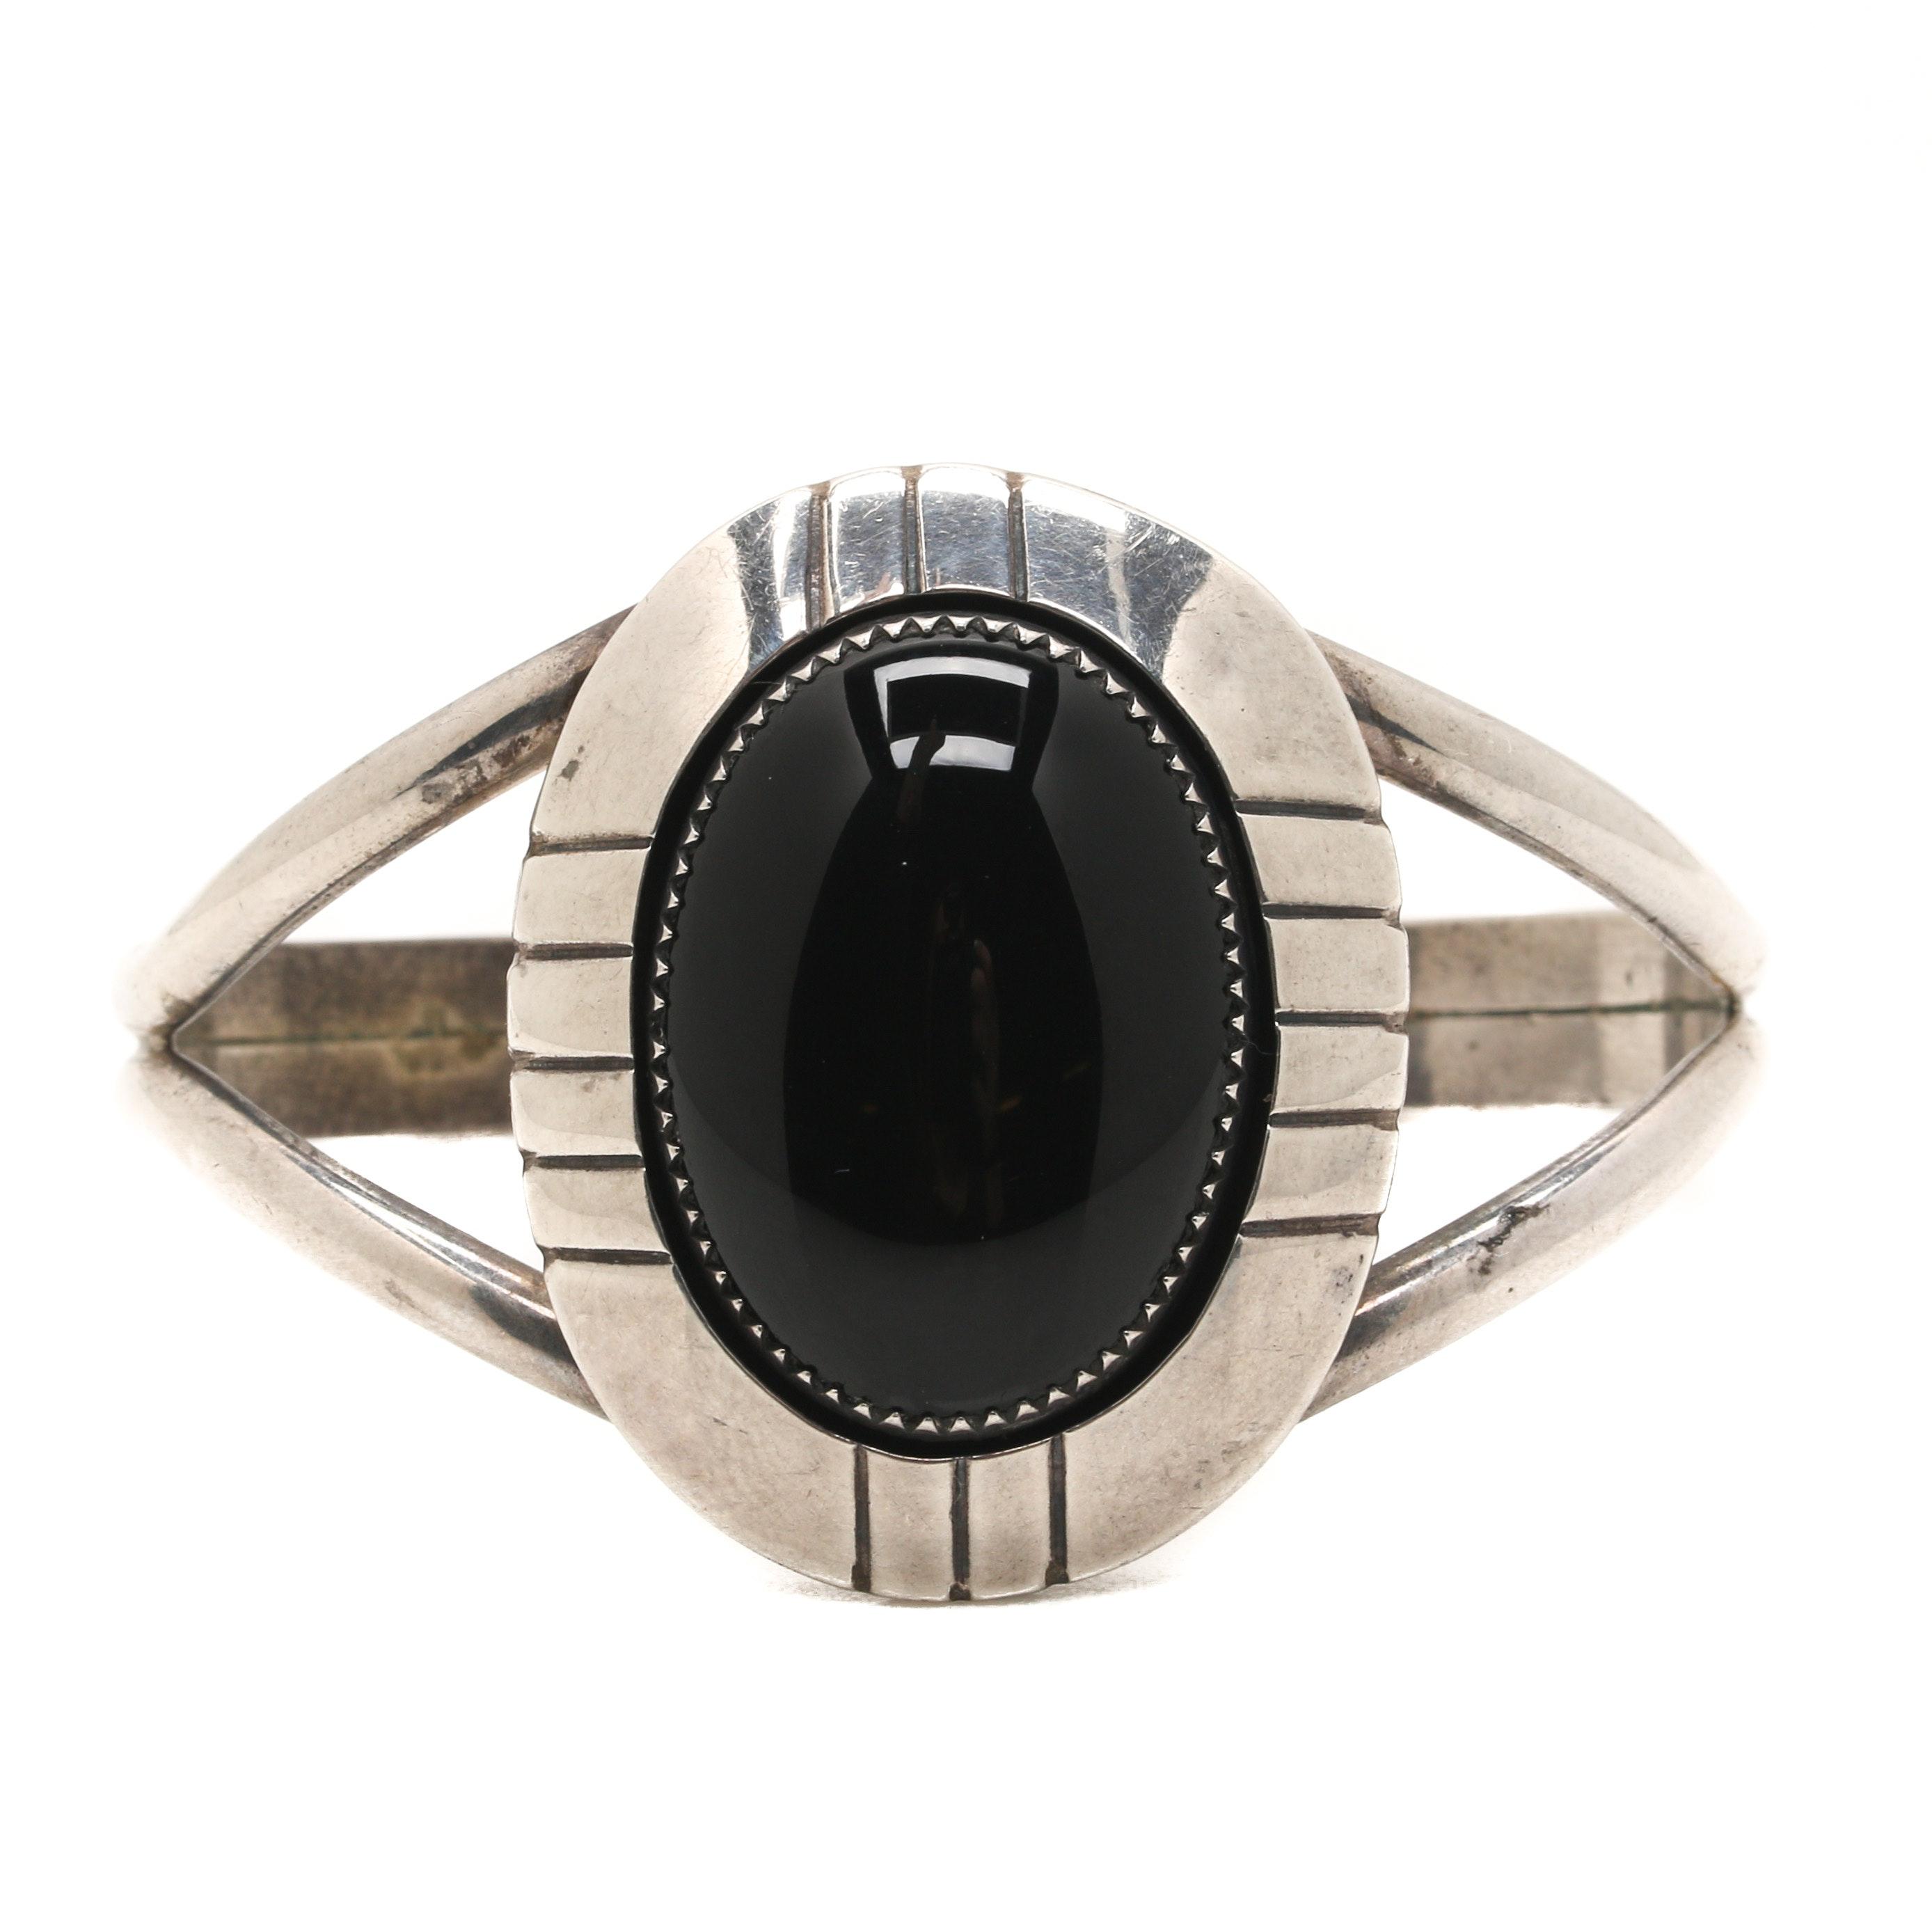 E. Yazzie Navajo Sterling Silver Black Onyx Cuff Bracelet